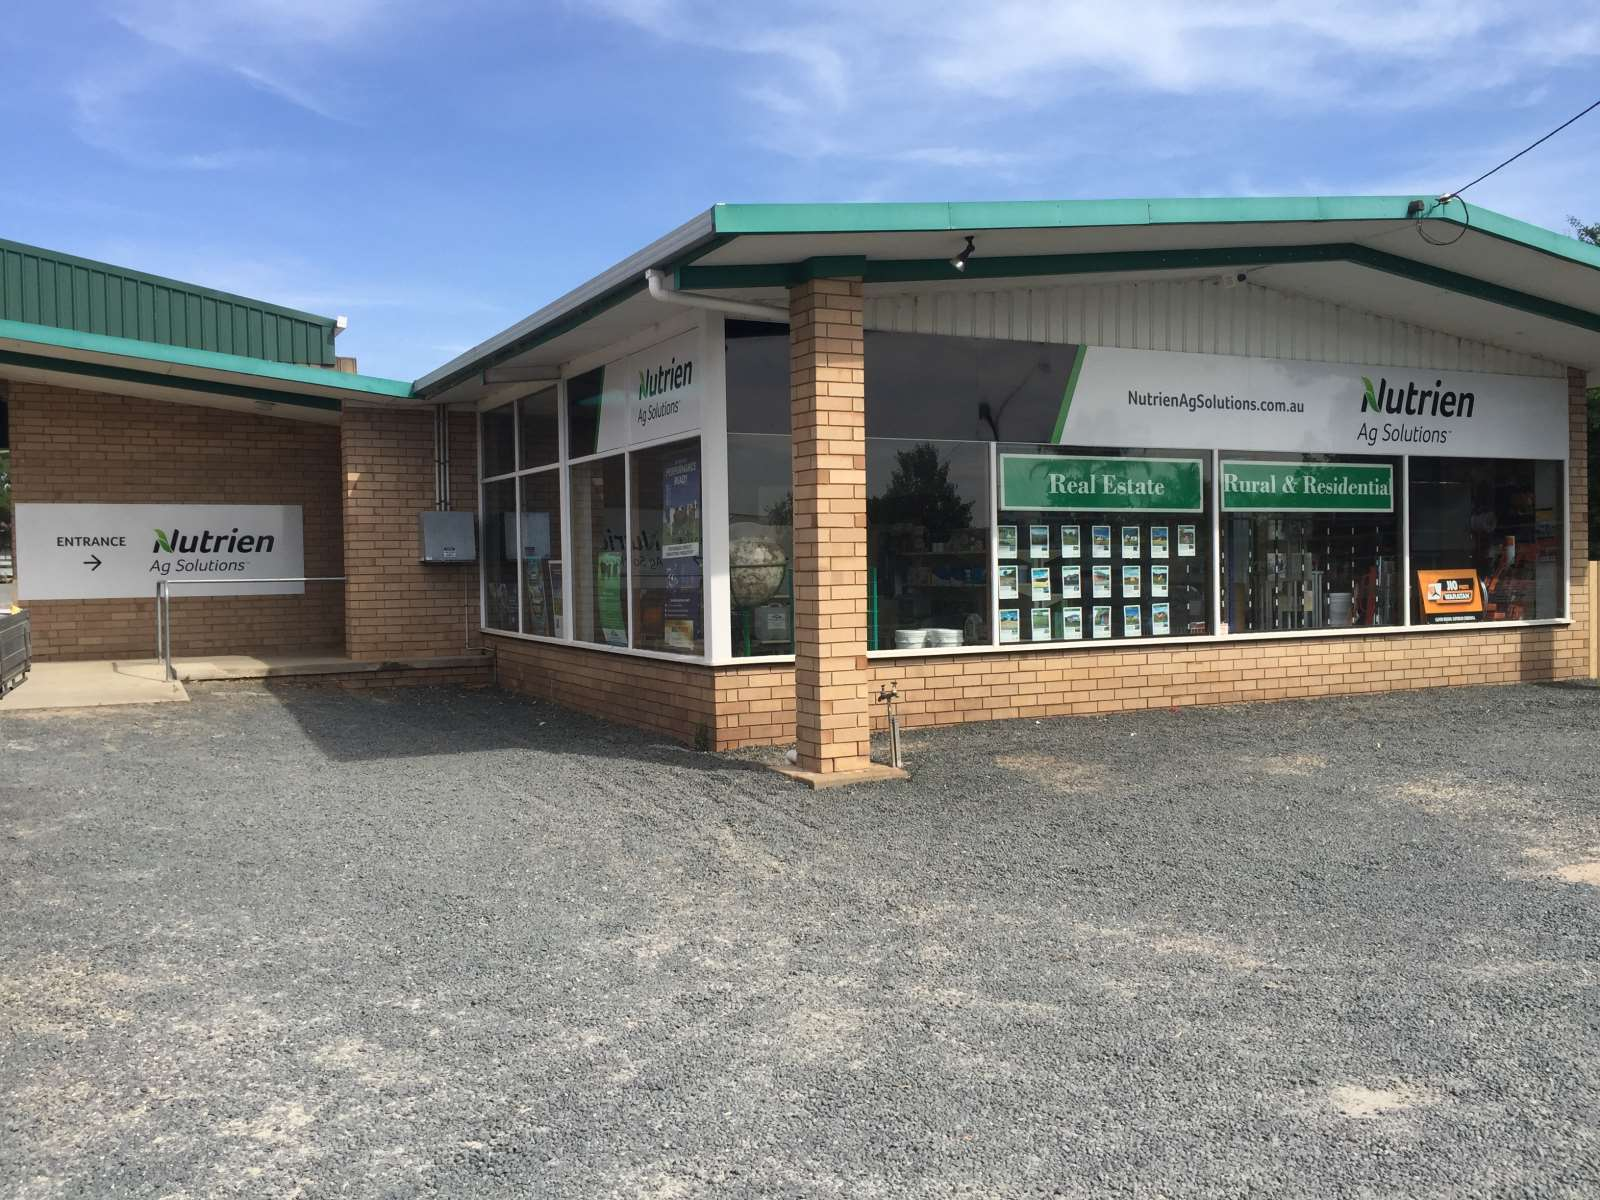 Nutrien Ag Solutions - Holbrook, NSW 2644 - (02) 6025 1677 | ShowMeLocal.com